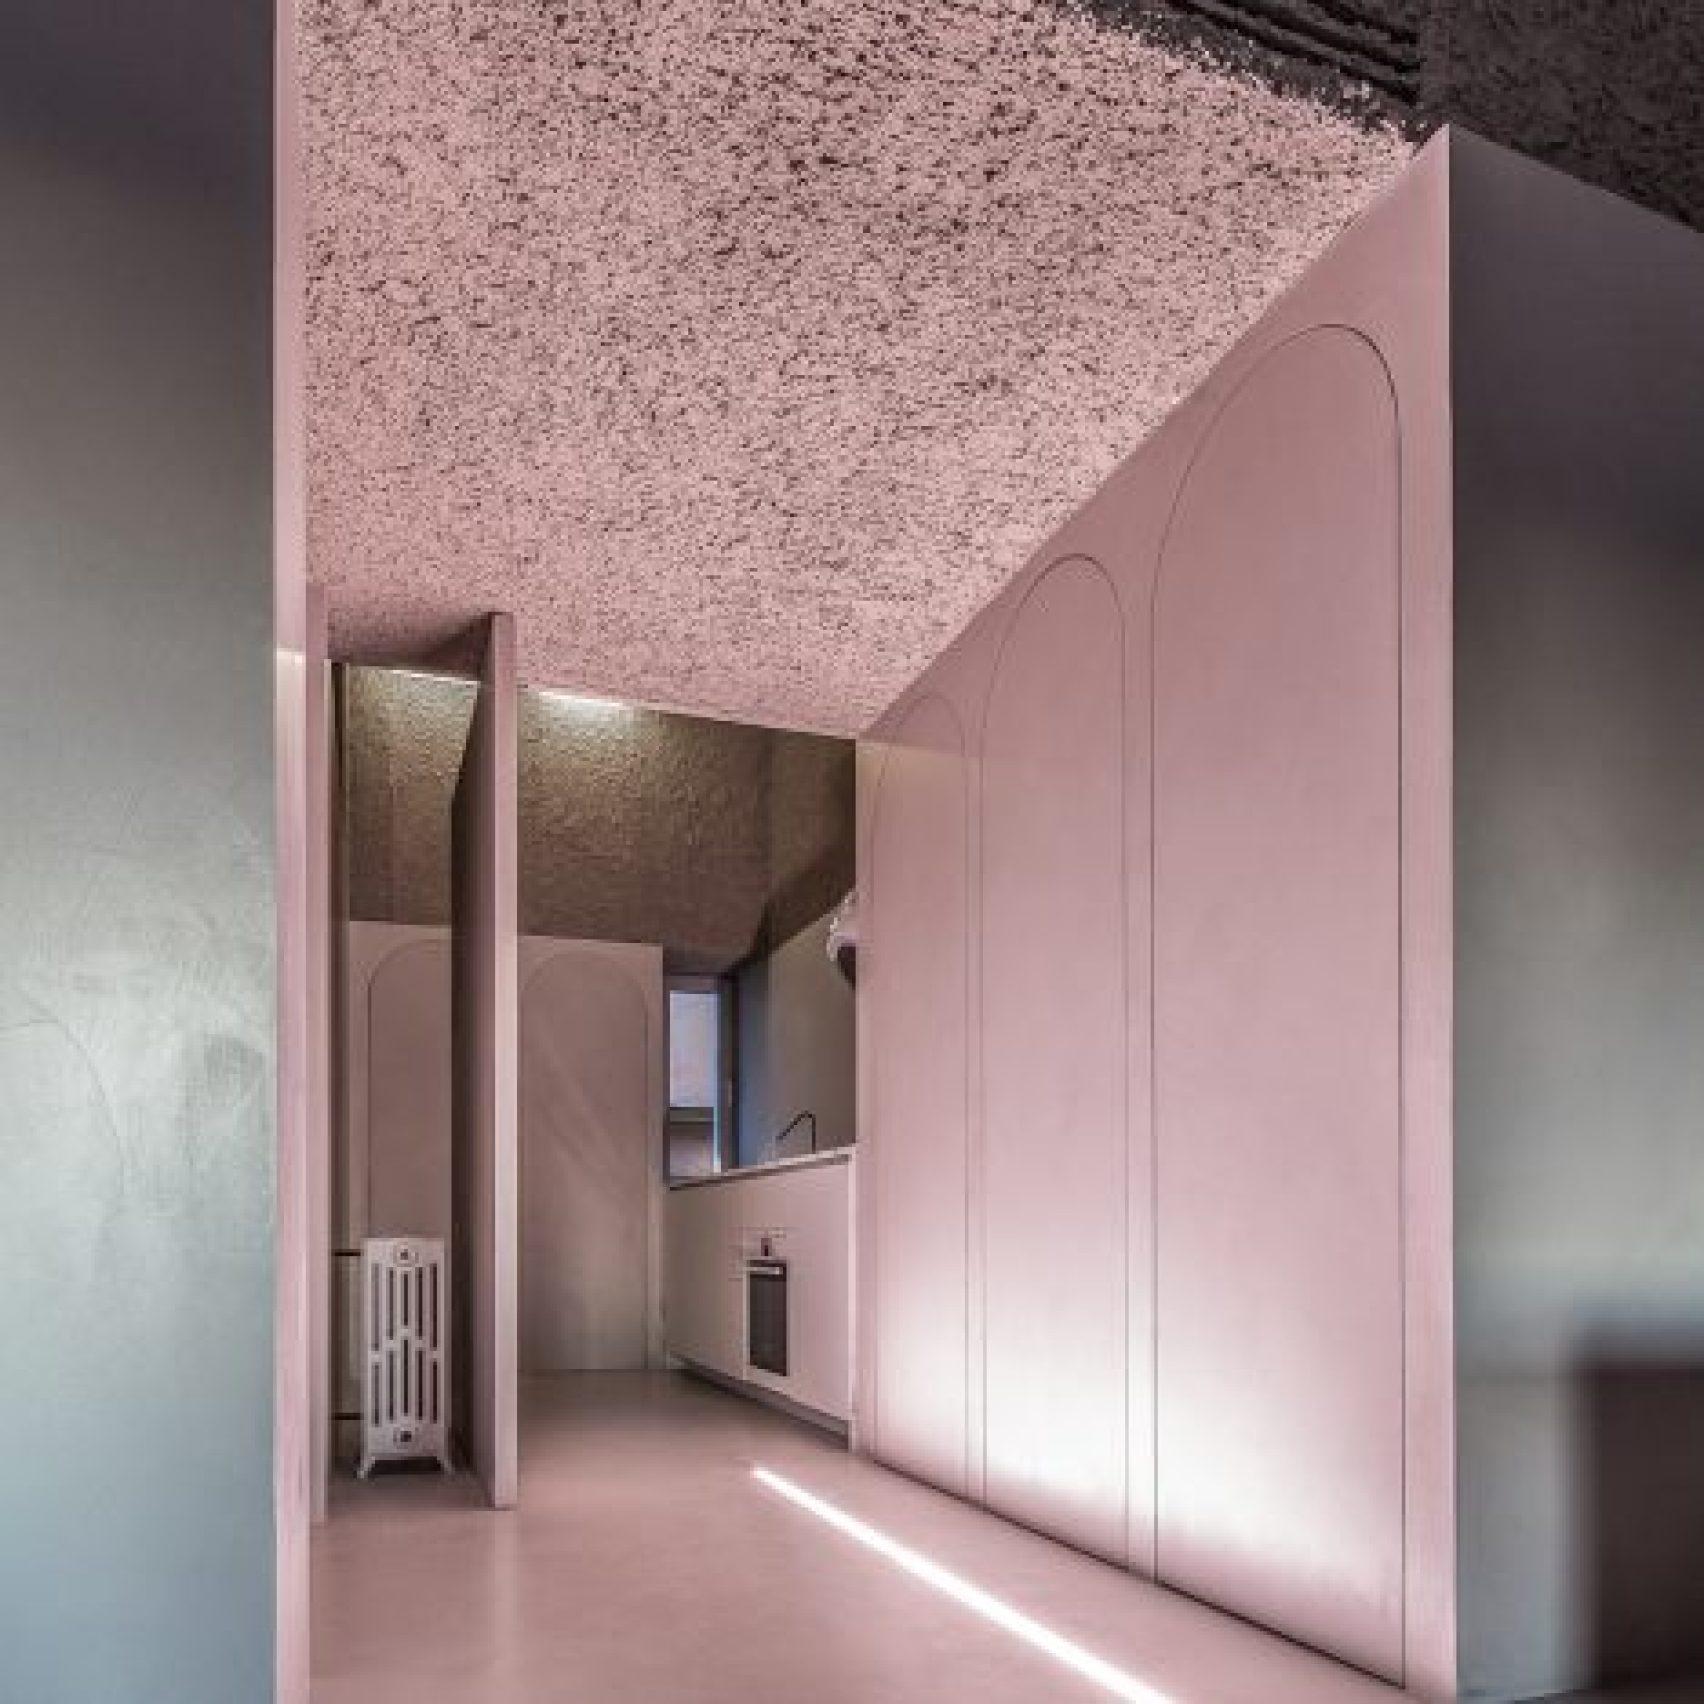 house-of-dust-cardillo-dezeen-sq